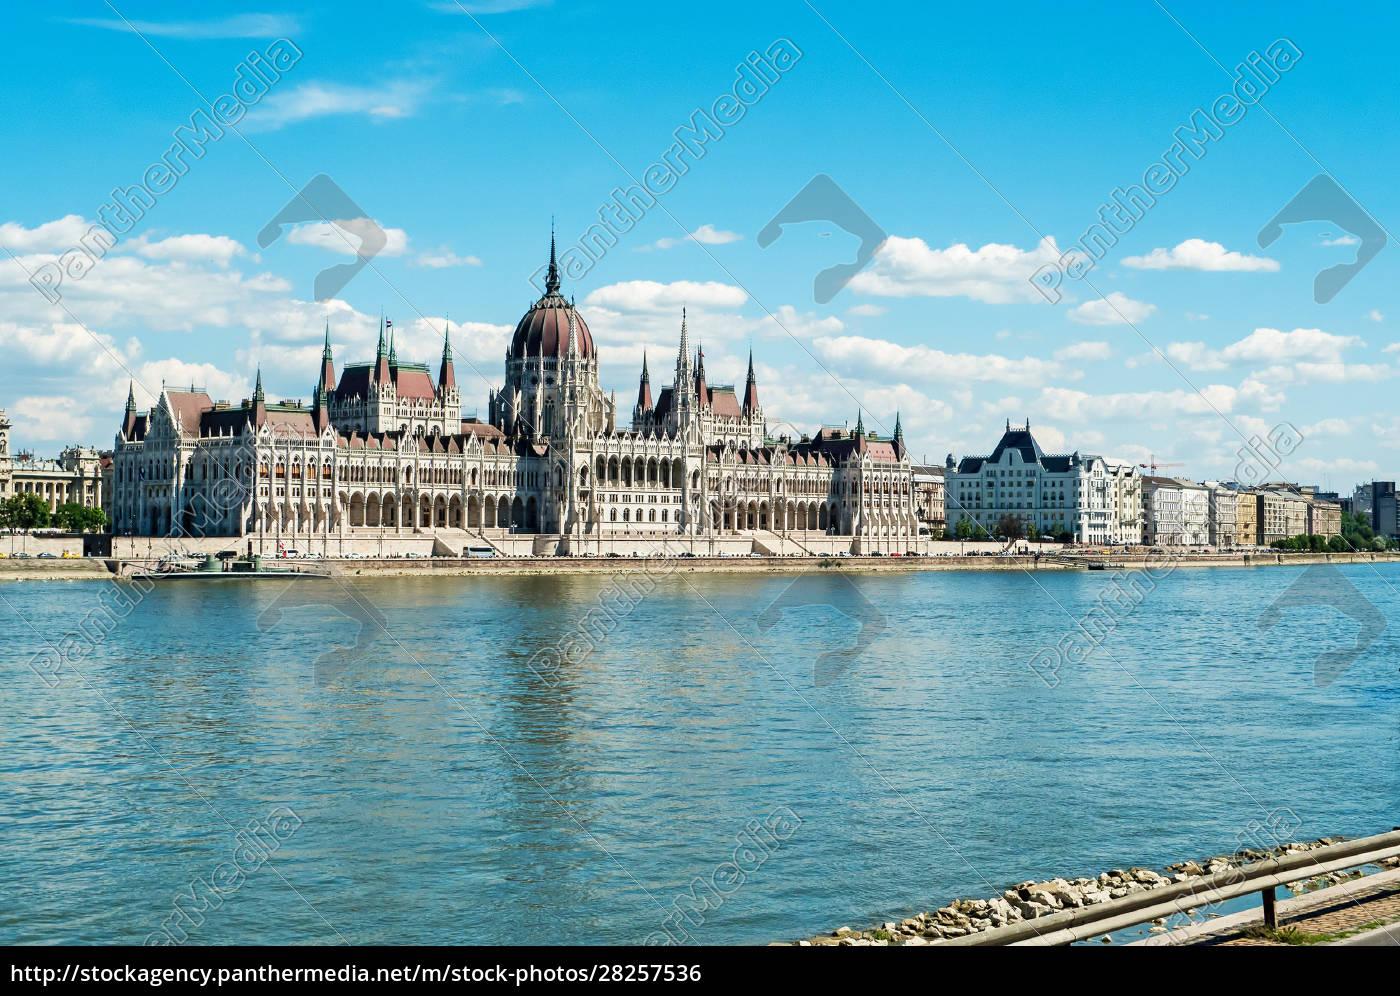 budapest, , hungary - 28257536